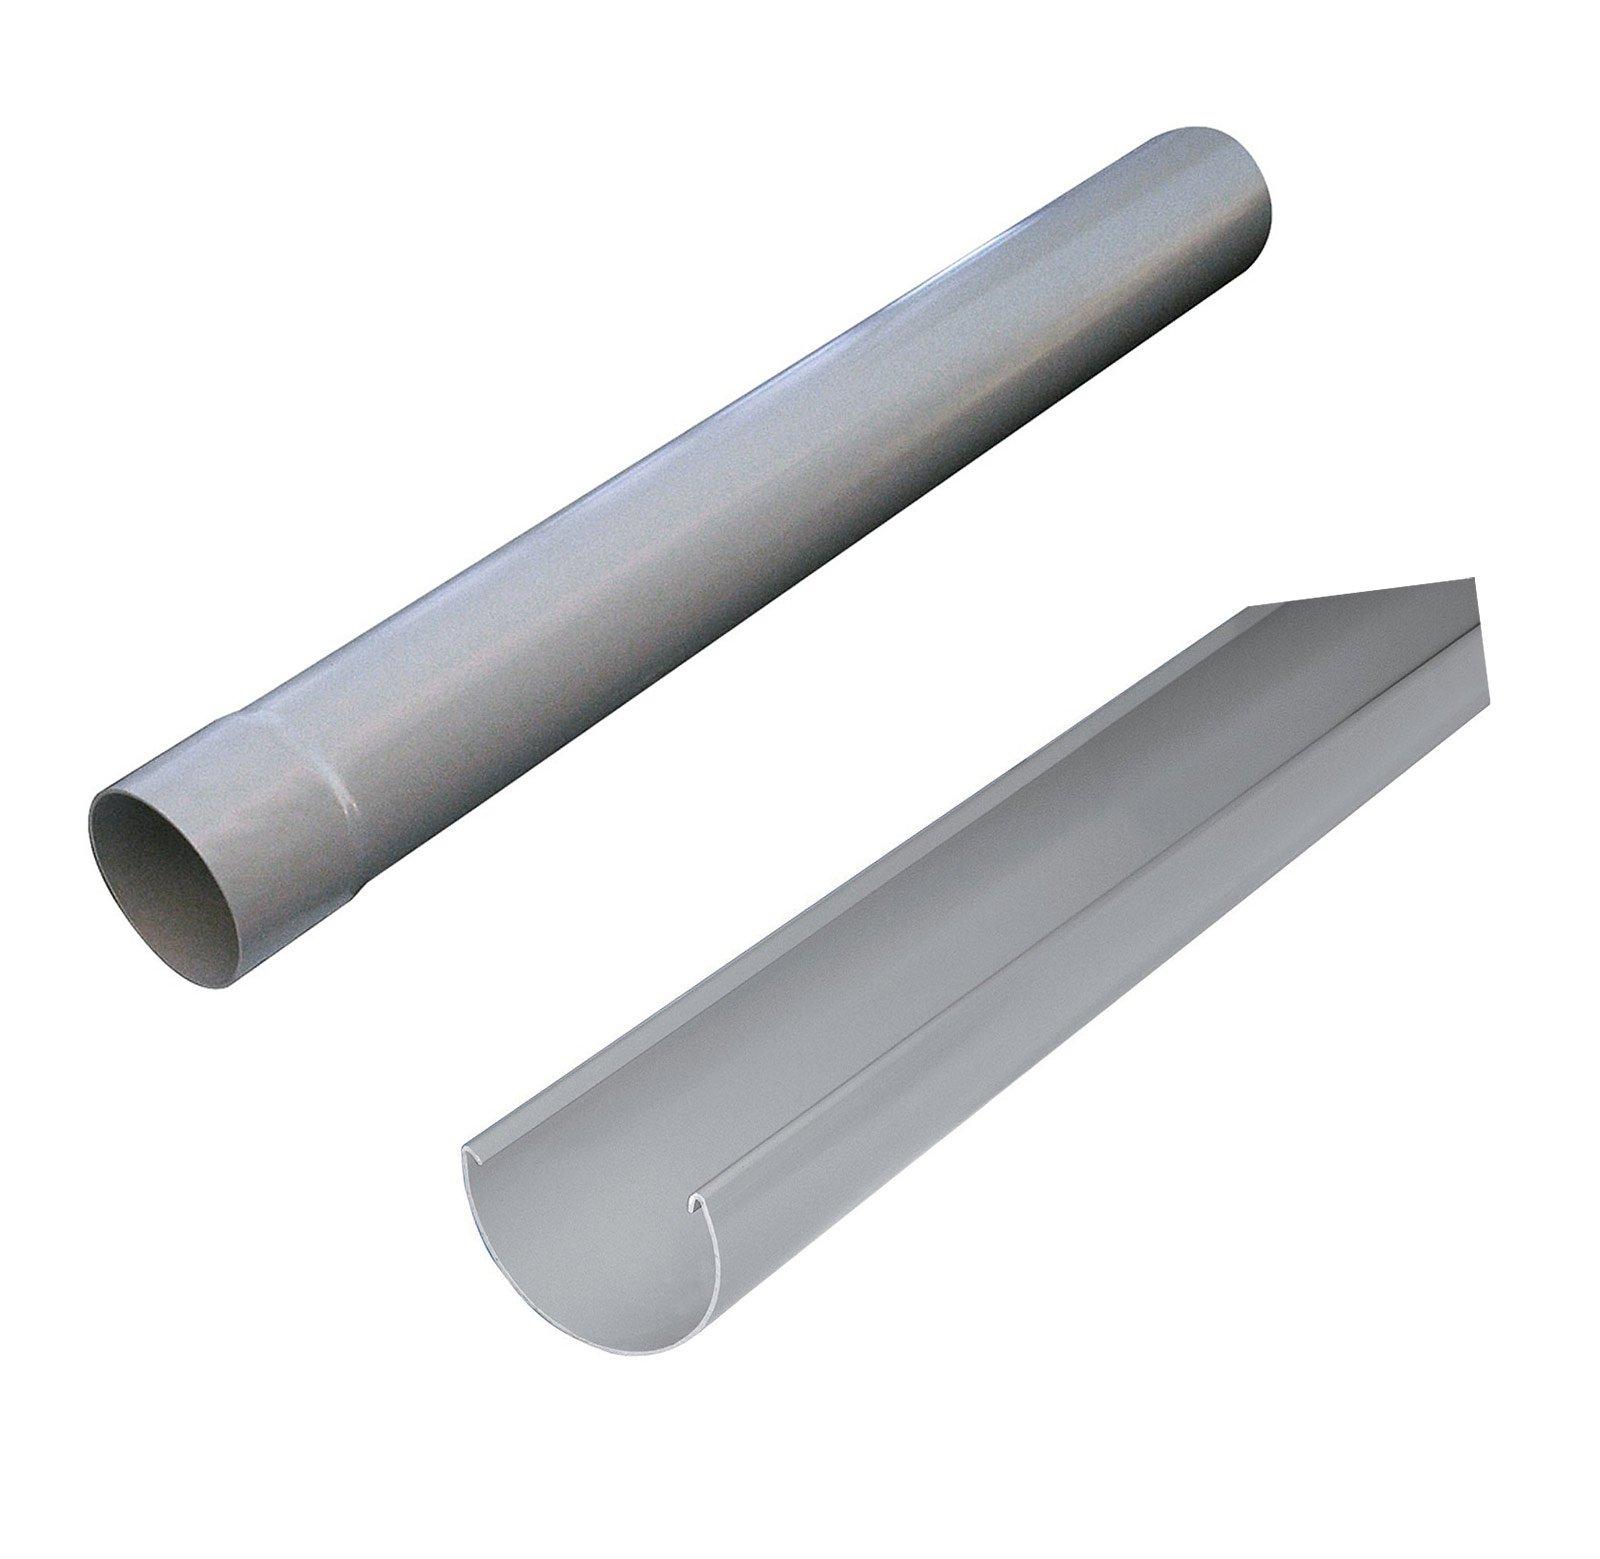 Tubos de chimenea leroy merlin cheap cool simple tubo - Tubo hierro cuadrado leroy merlin ...